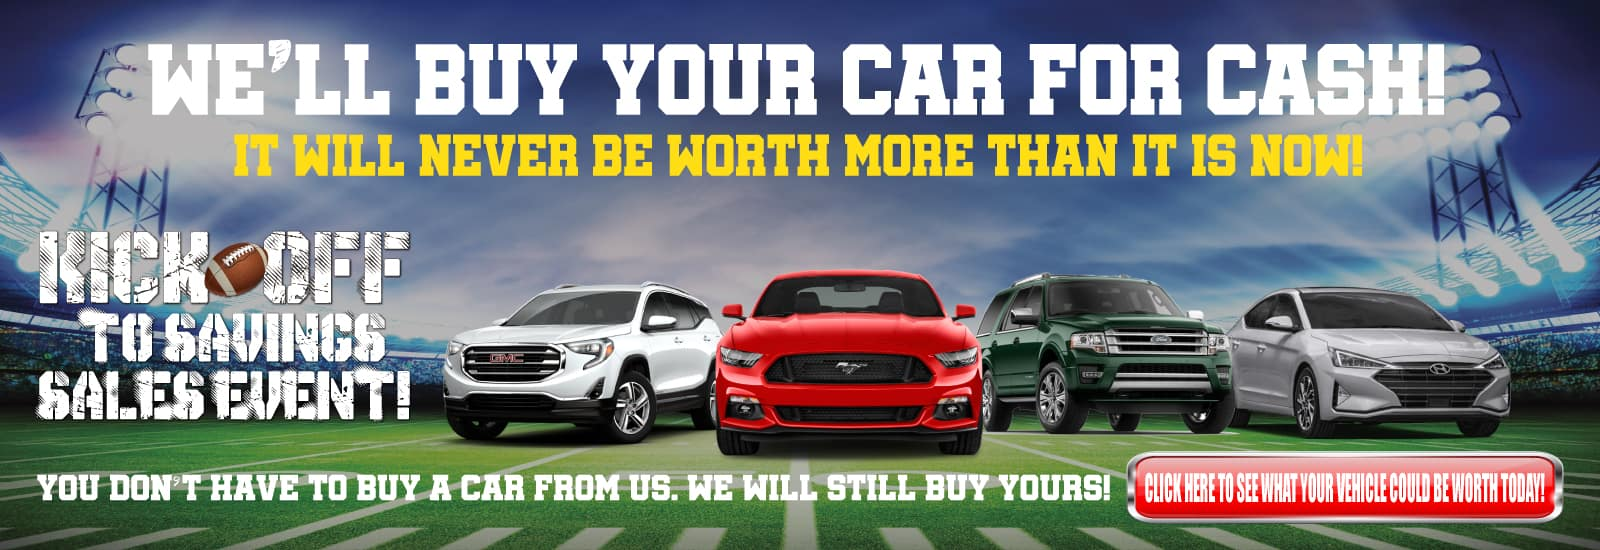 We-Will-Buy-Your-Car-Web-Banner-1600×550.jpg-Sept